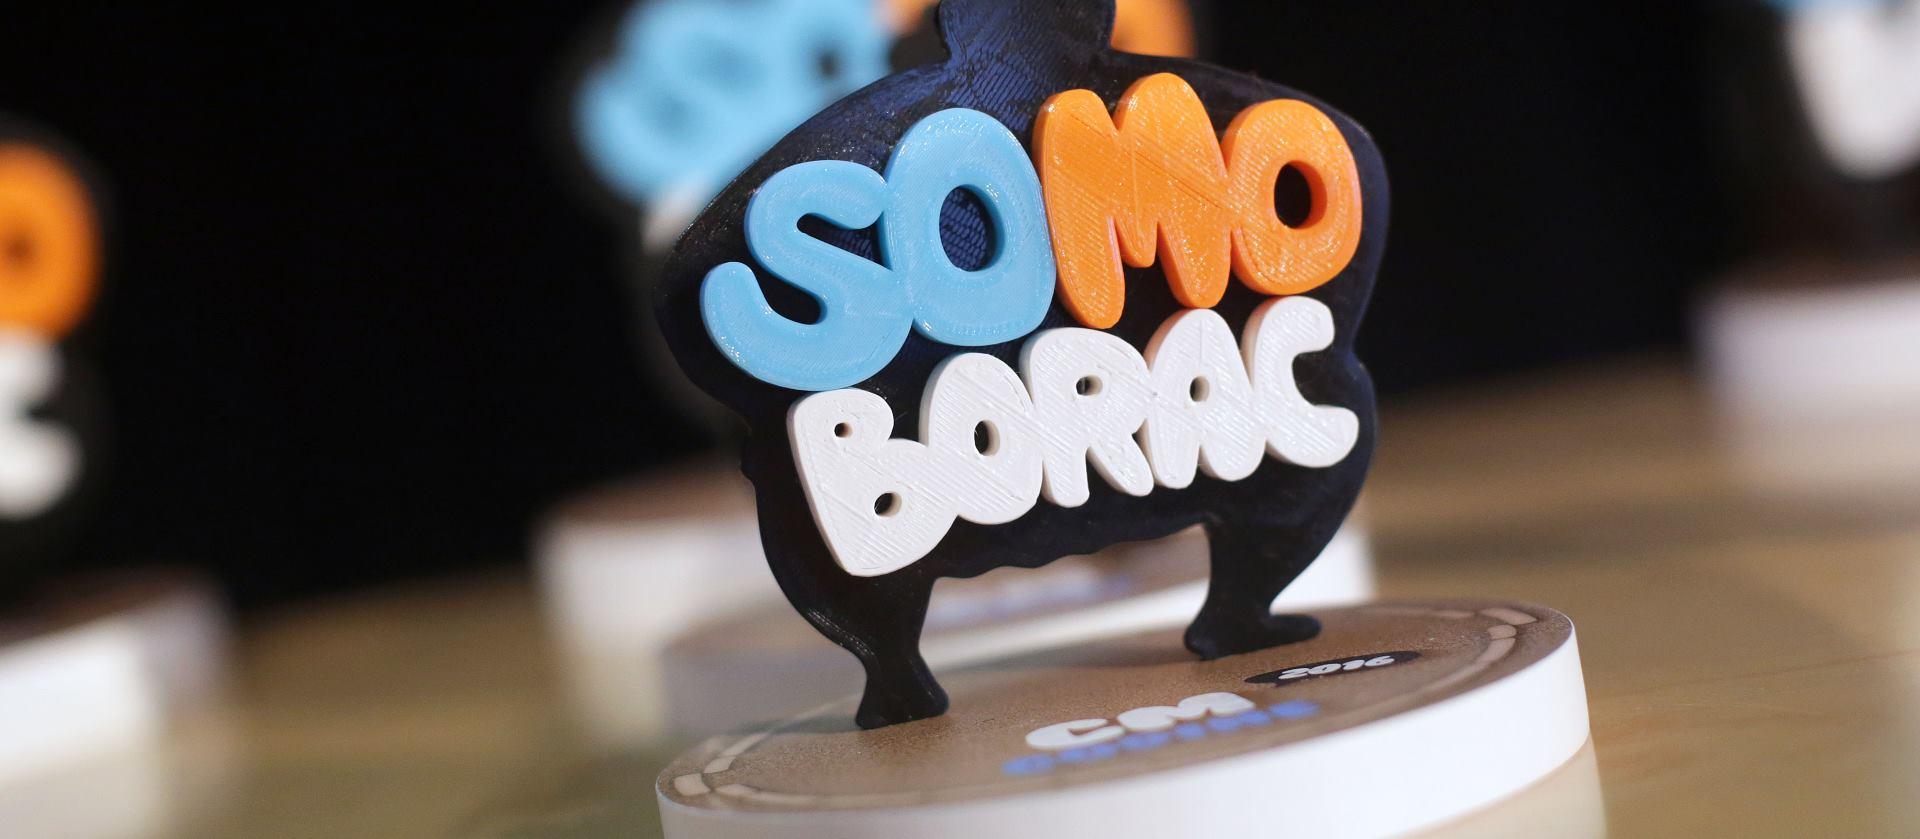 WEEKEND MEDIA FESTIVAL Brojne novosti na petom SoMo Borcu